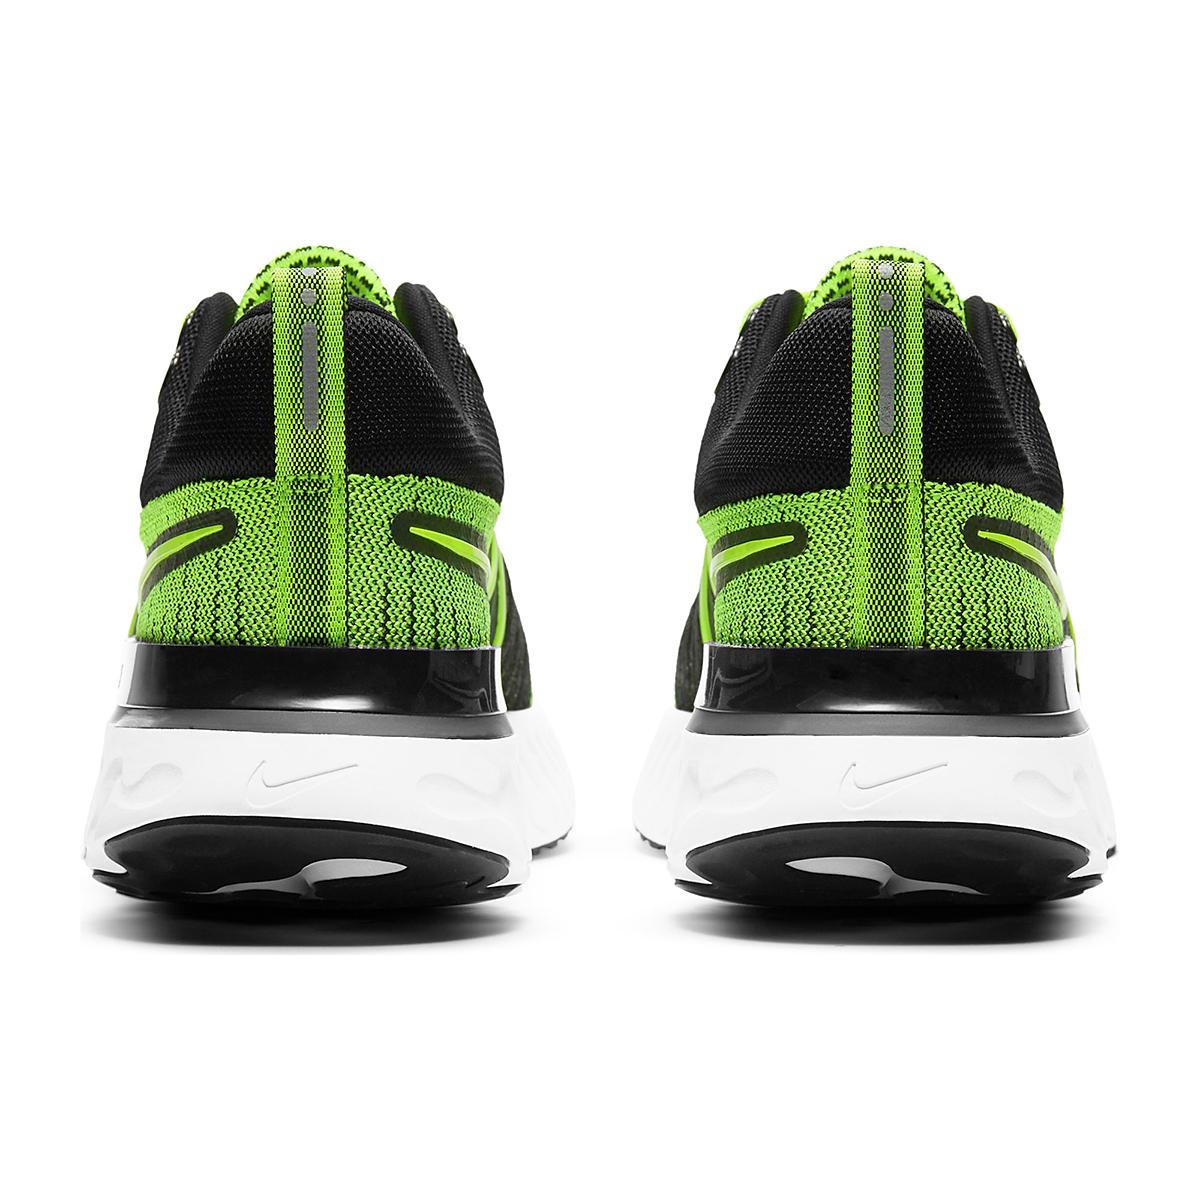 Men's Nike React Infinity Run Flyknit 2 Running Shoe - Color: Volt/Black - Size: 6 - Width: Regular, Volt/Black, large, image 6